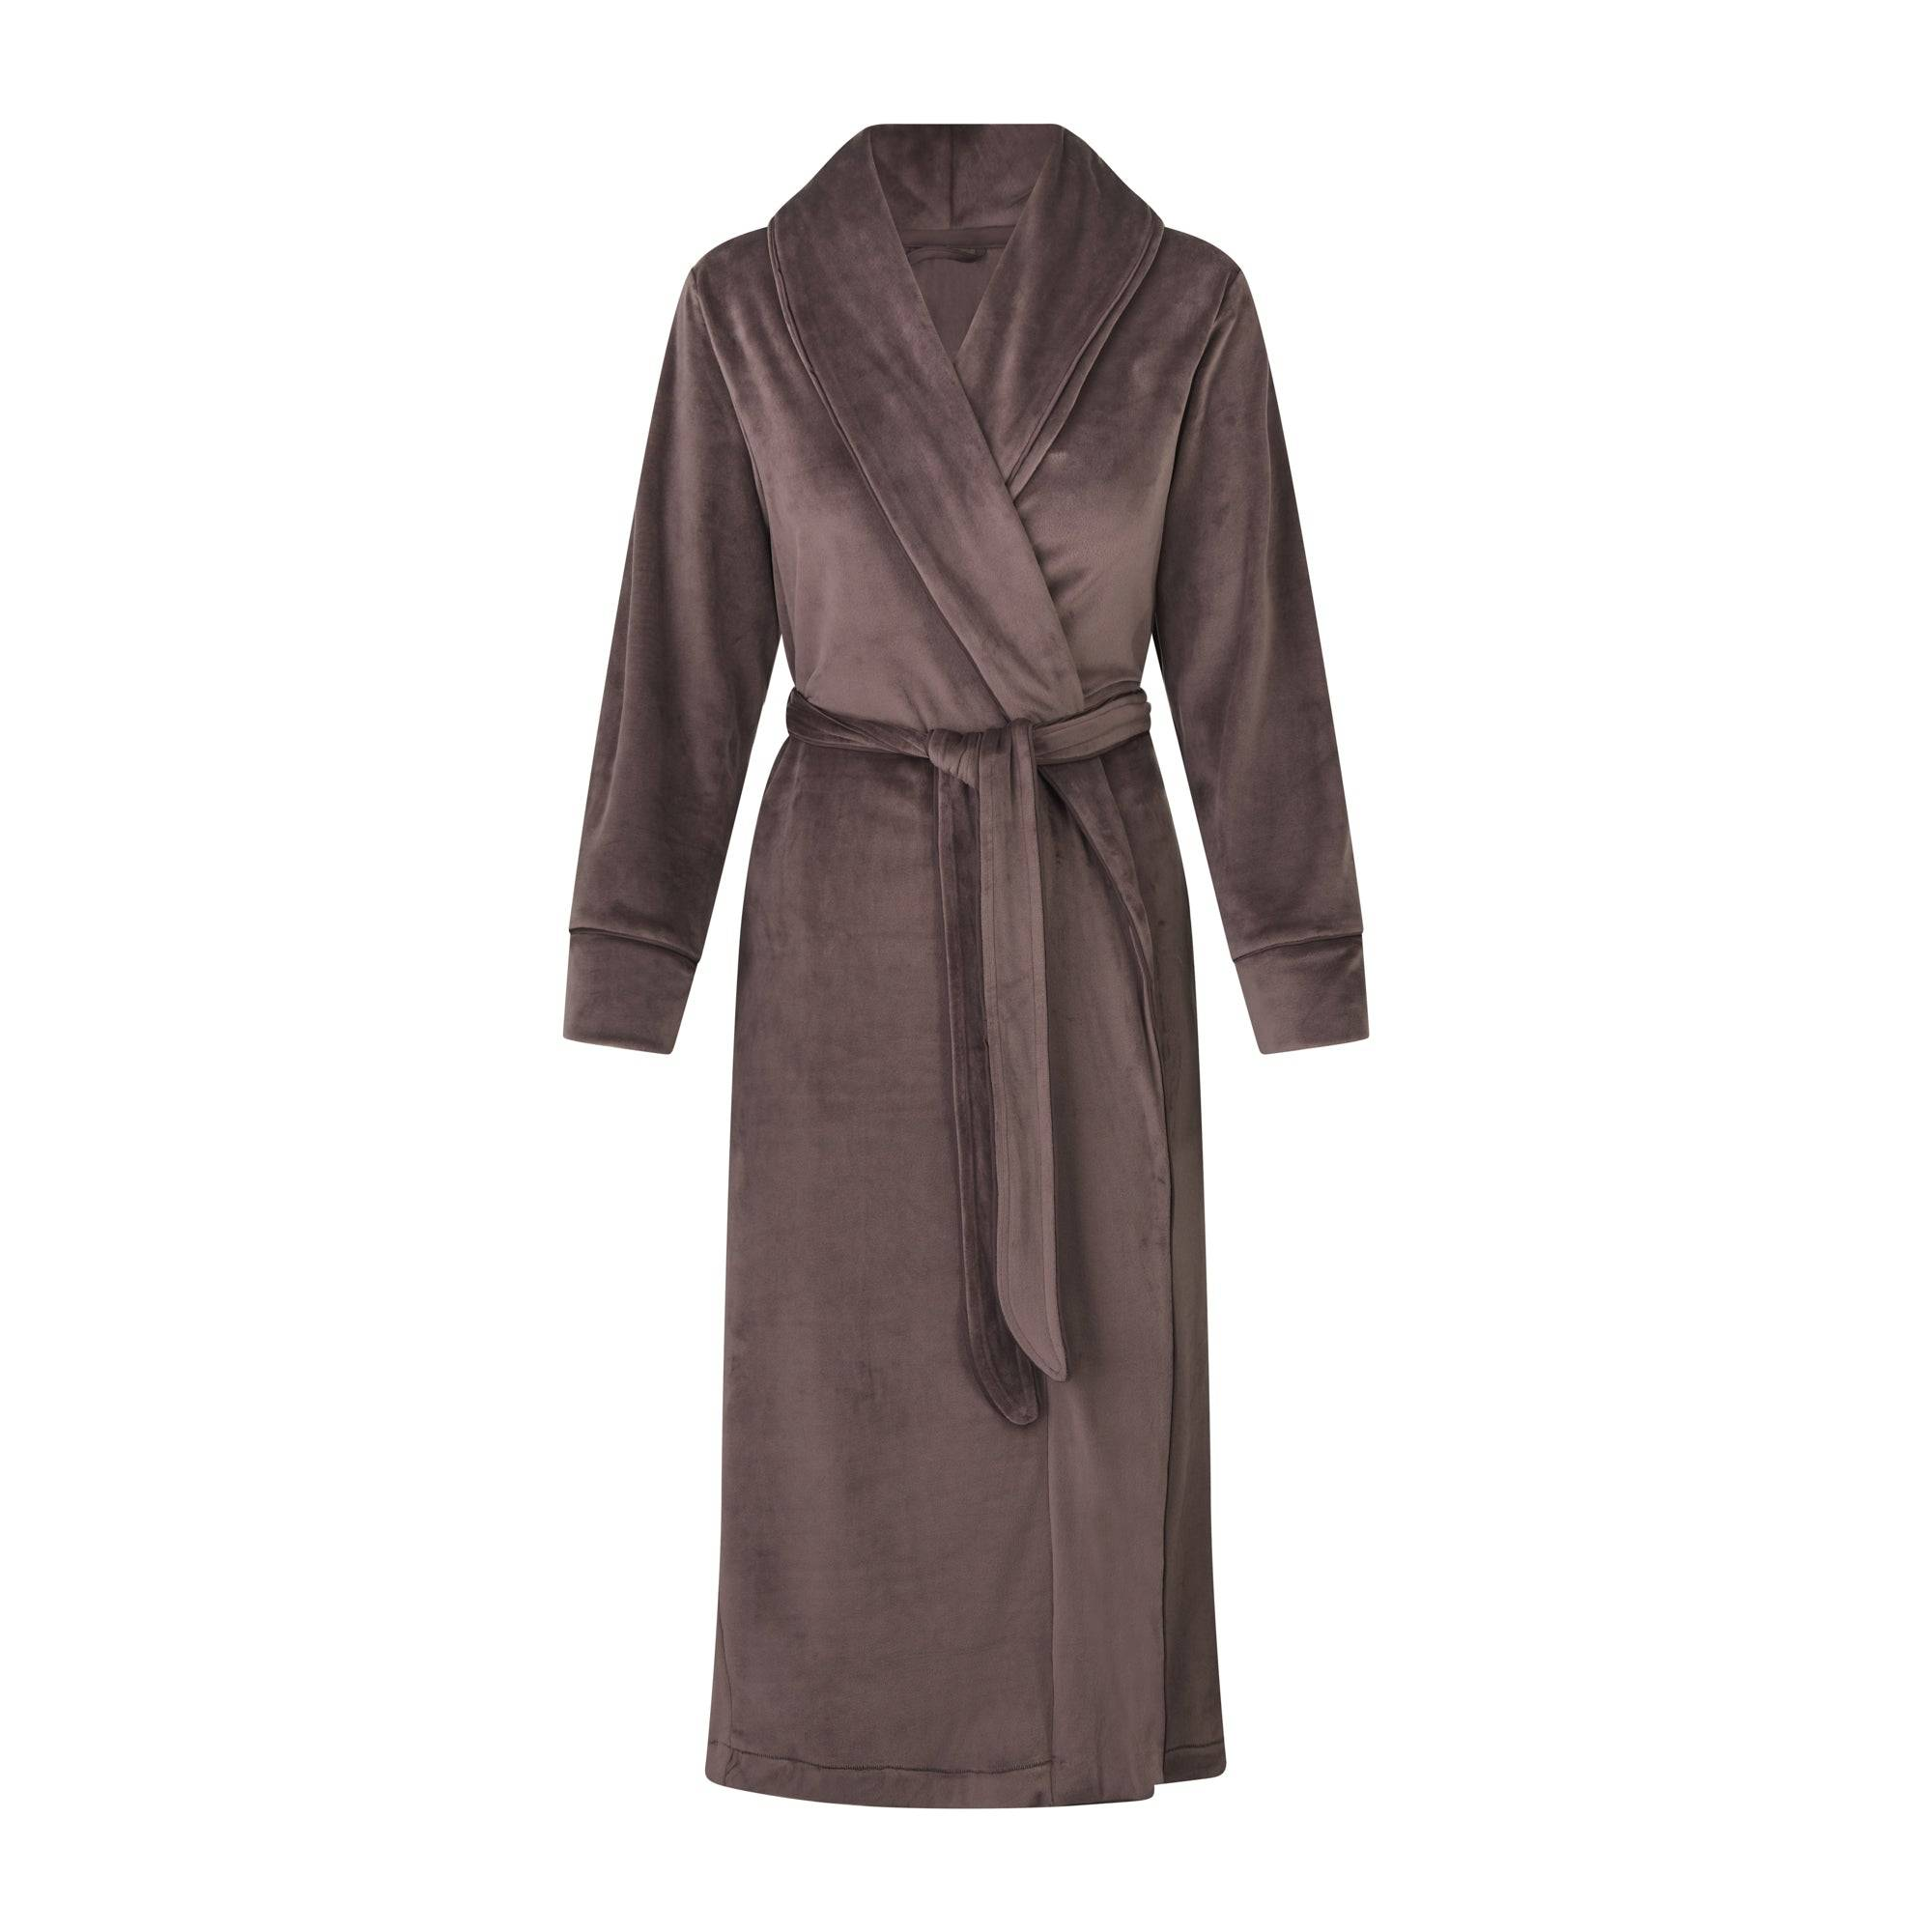 SKIMS Women's Velour Long Robe - Brown - Size XS; Brown